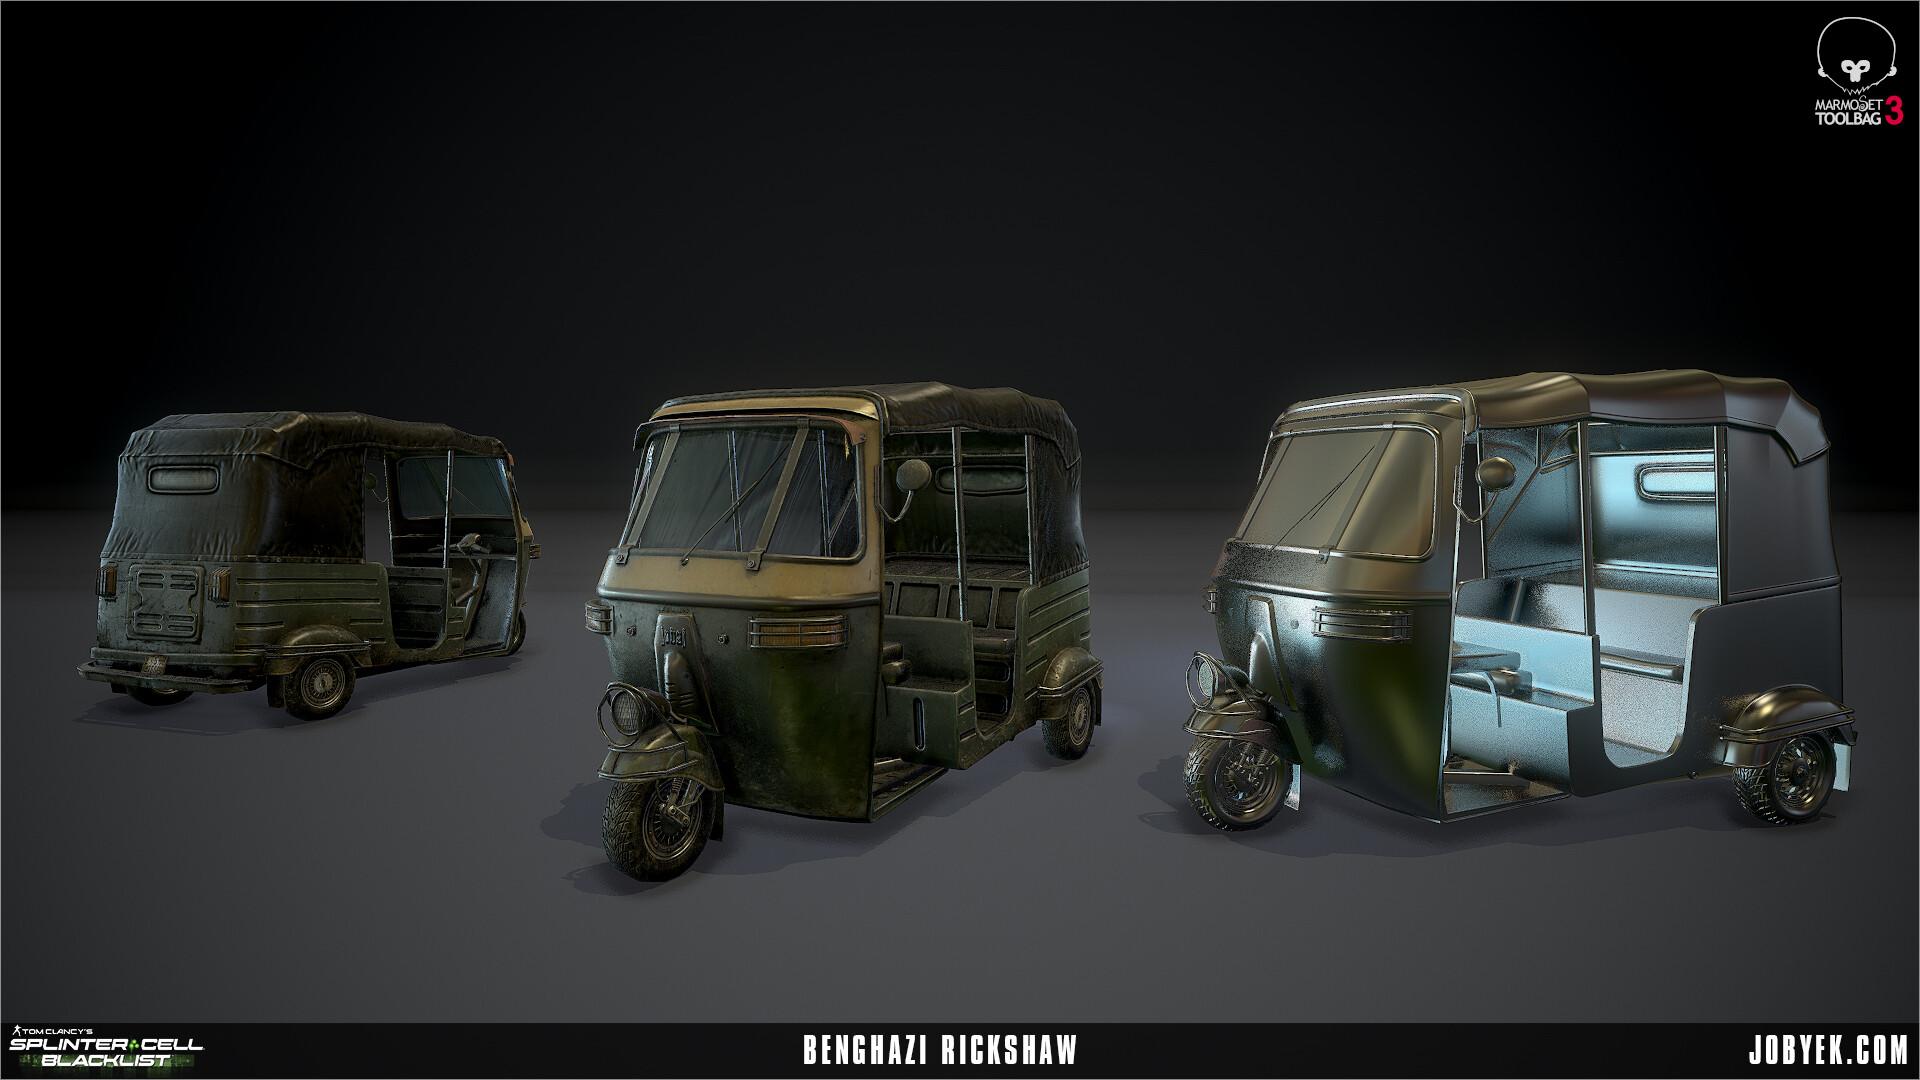 Jobye kyle karmaker scb prop rickshaw 01